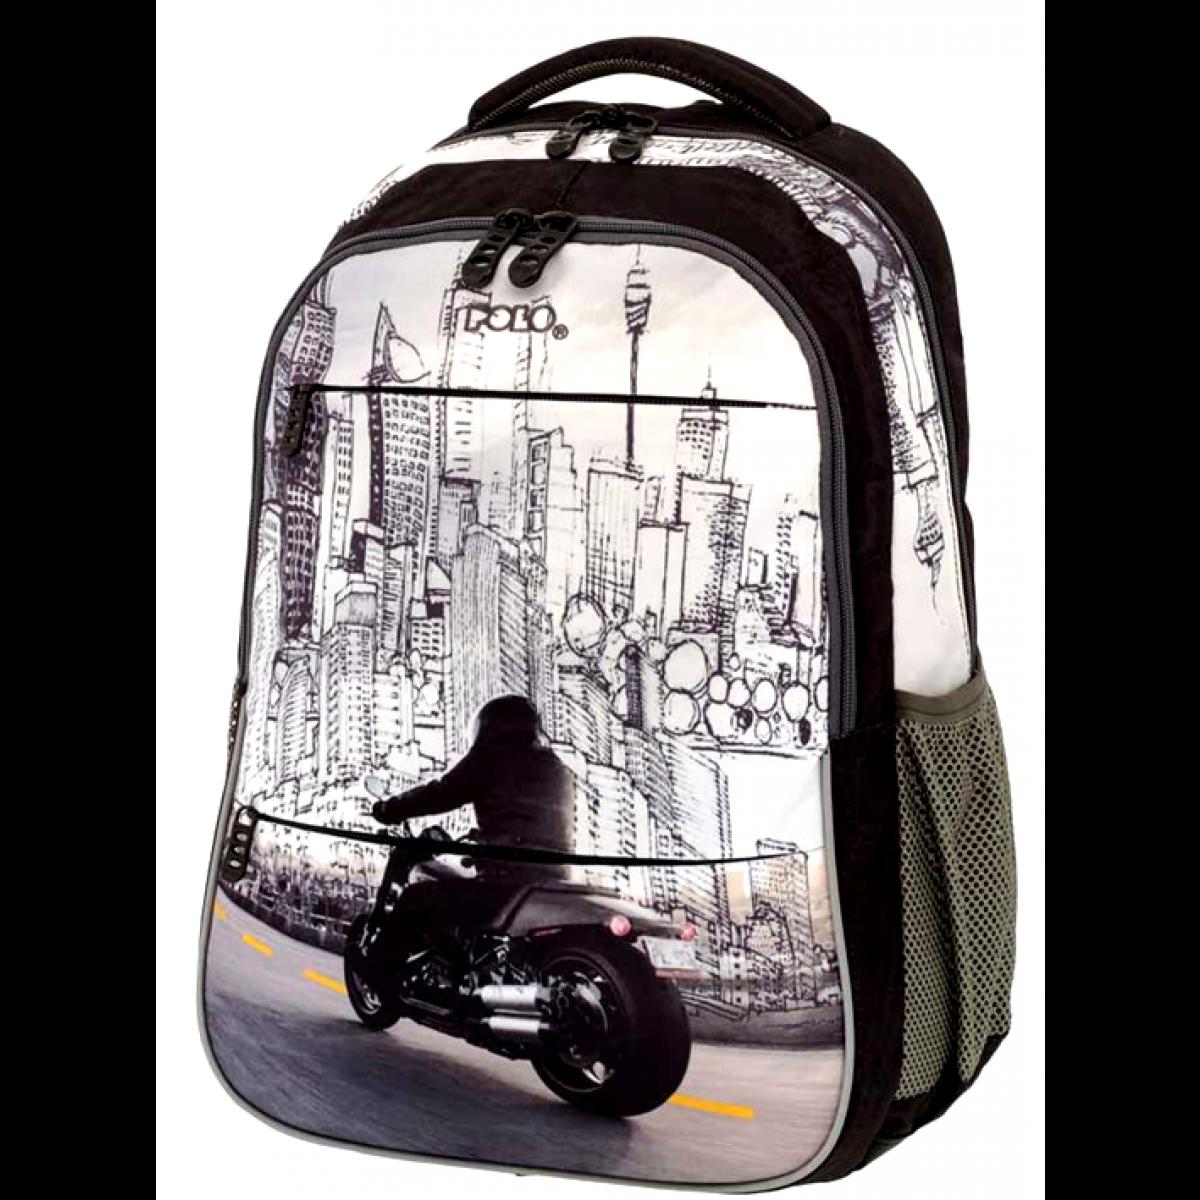 af80b0d261a POLO Τσάντα Dragon Bike (9-01-238-02) - ZAHARIAS ESHOP